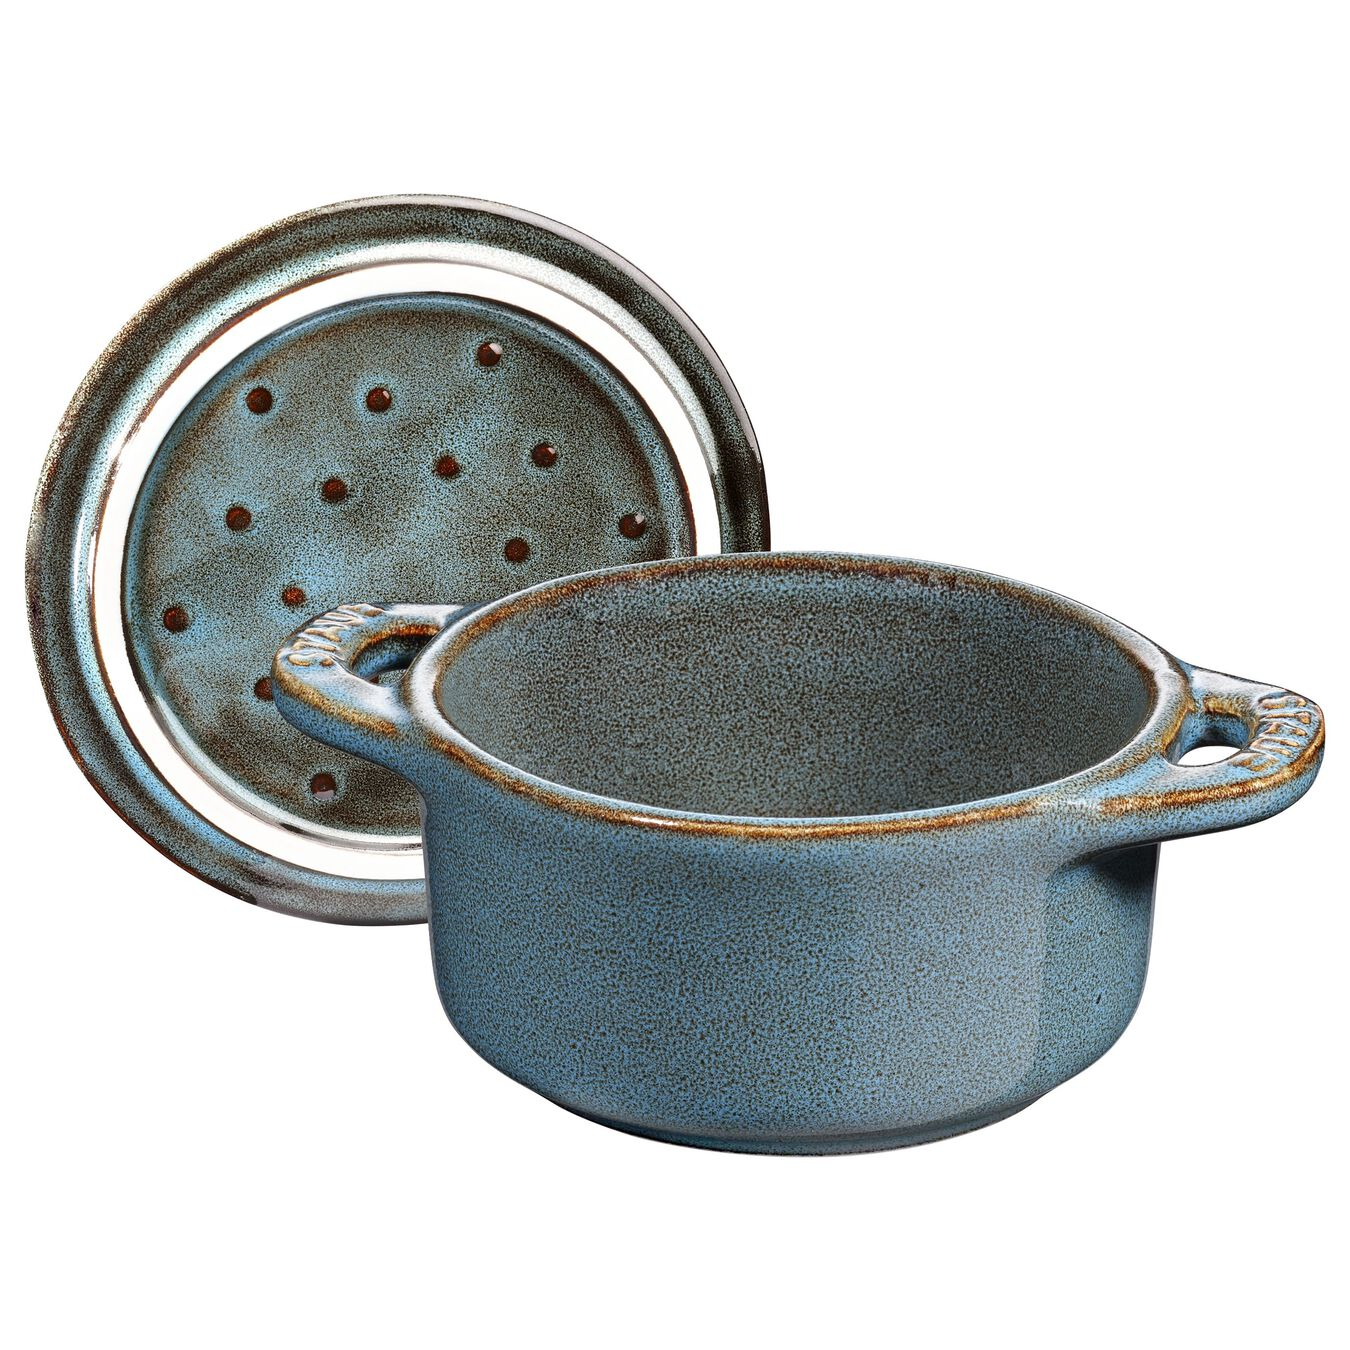 Mini Cocotte 10 cm, rund, Antik-Türkis, Keramik,,large 2